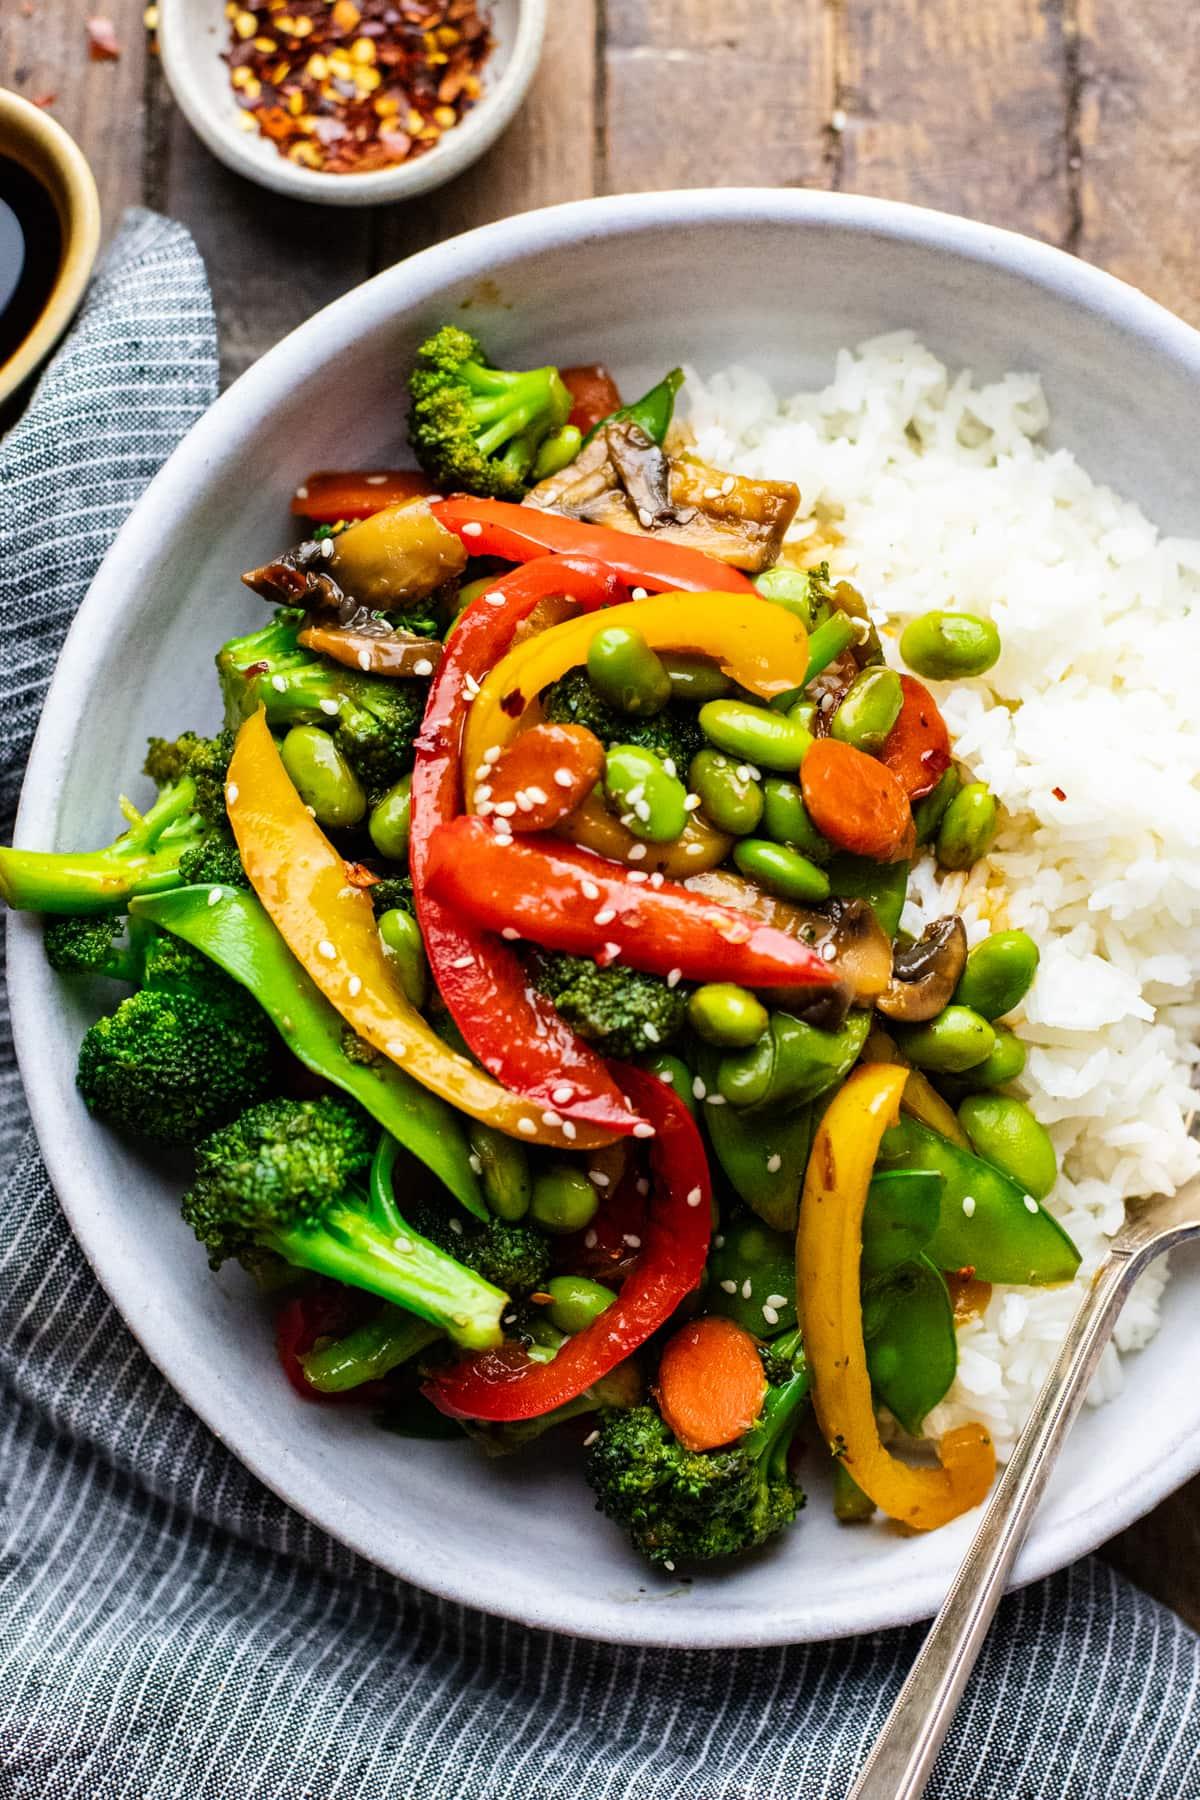 30-Minute Stir Fry Vegetables – A Simple Palate